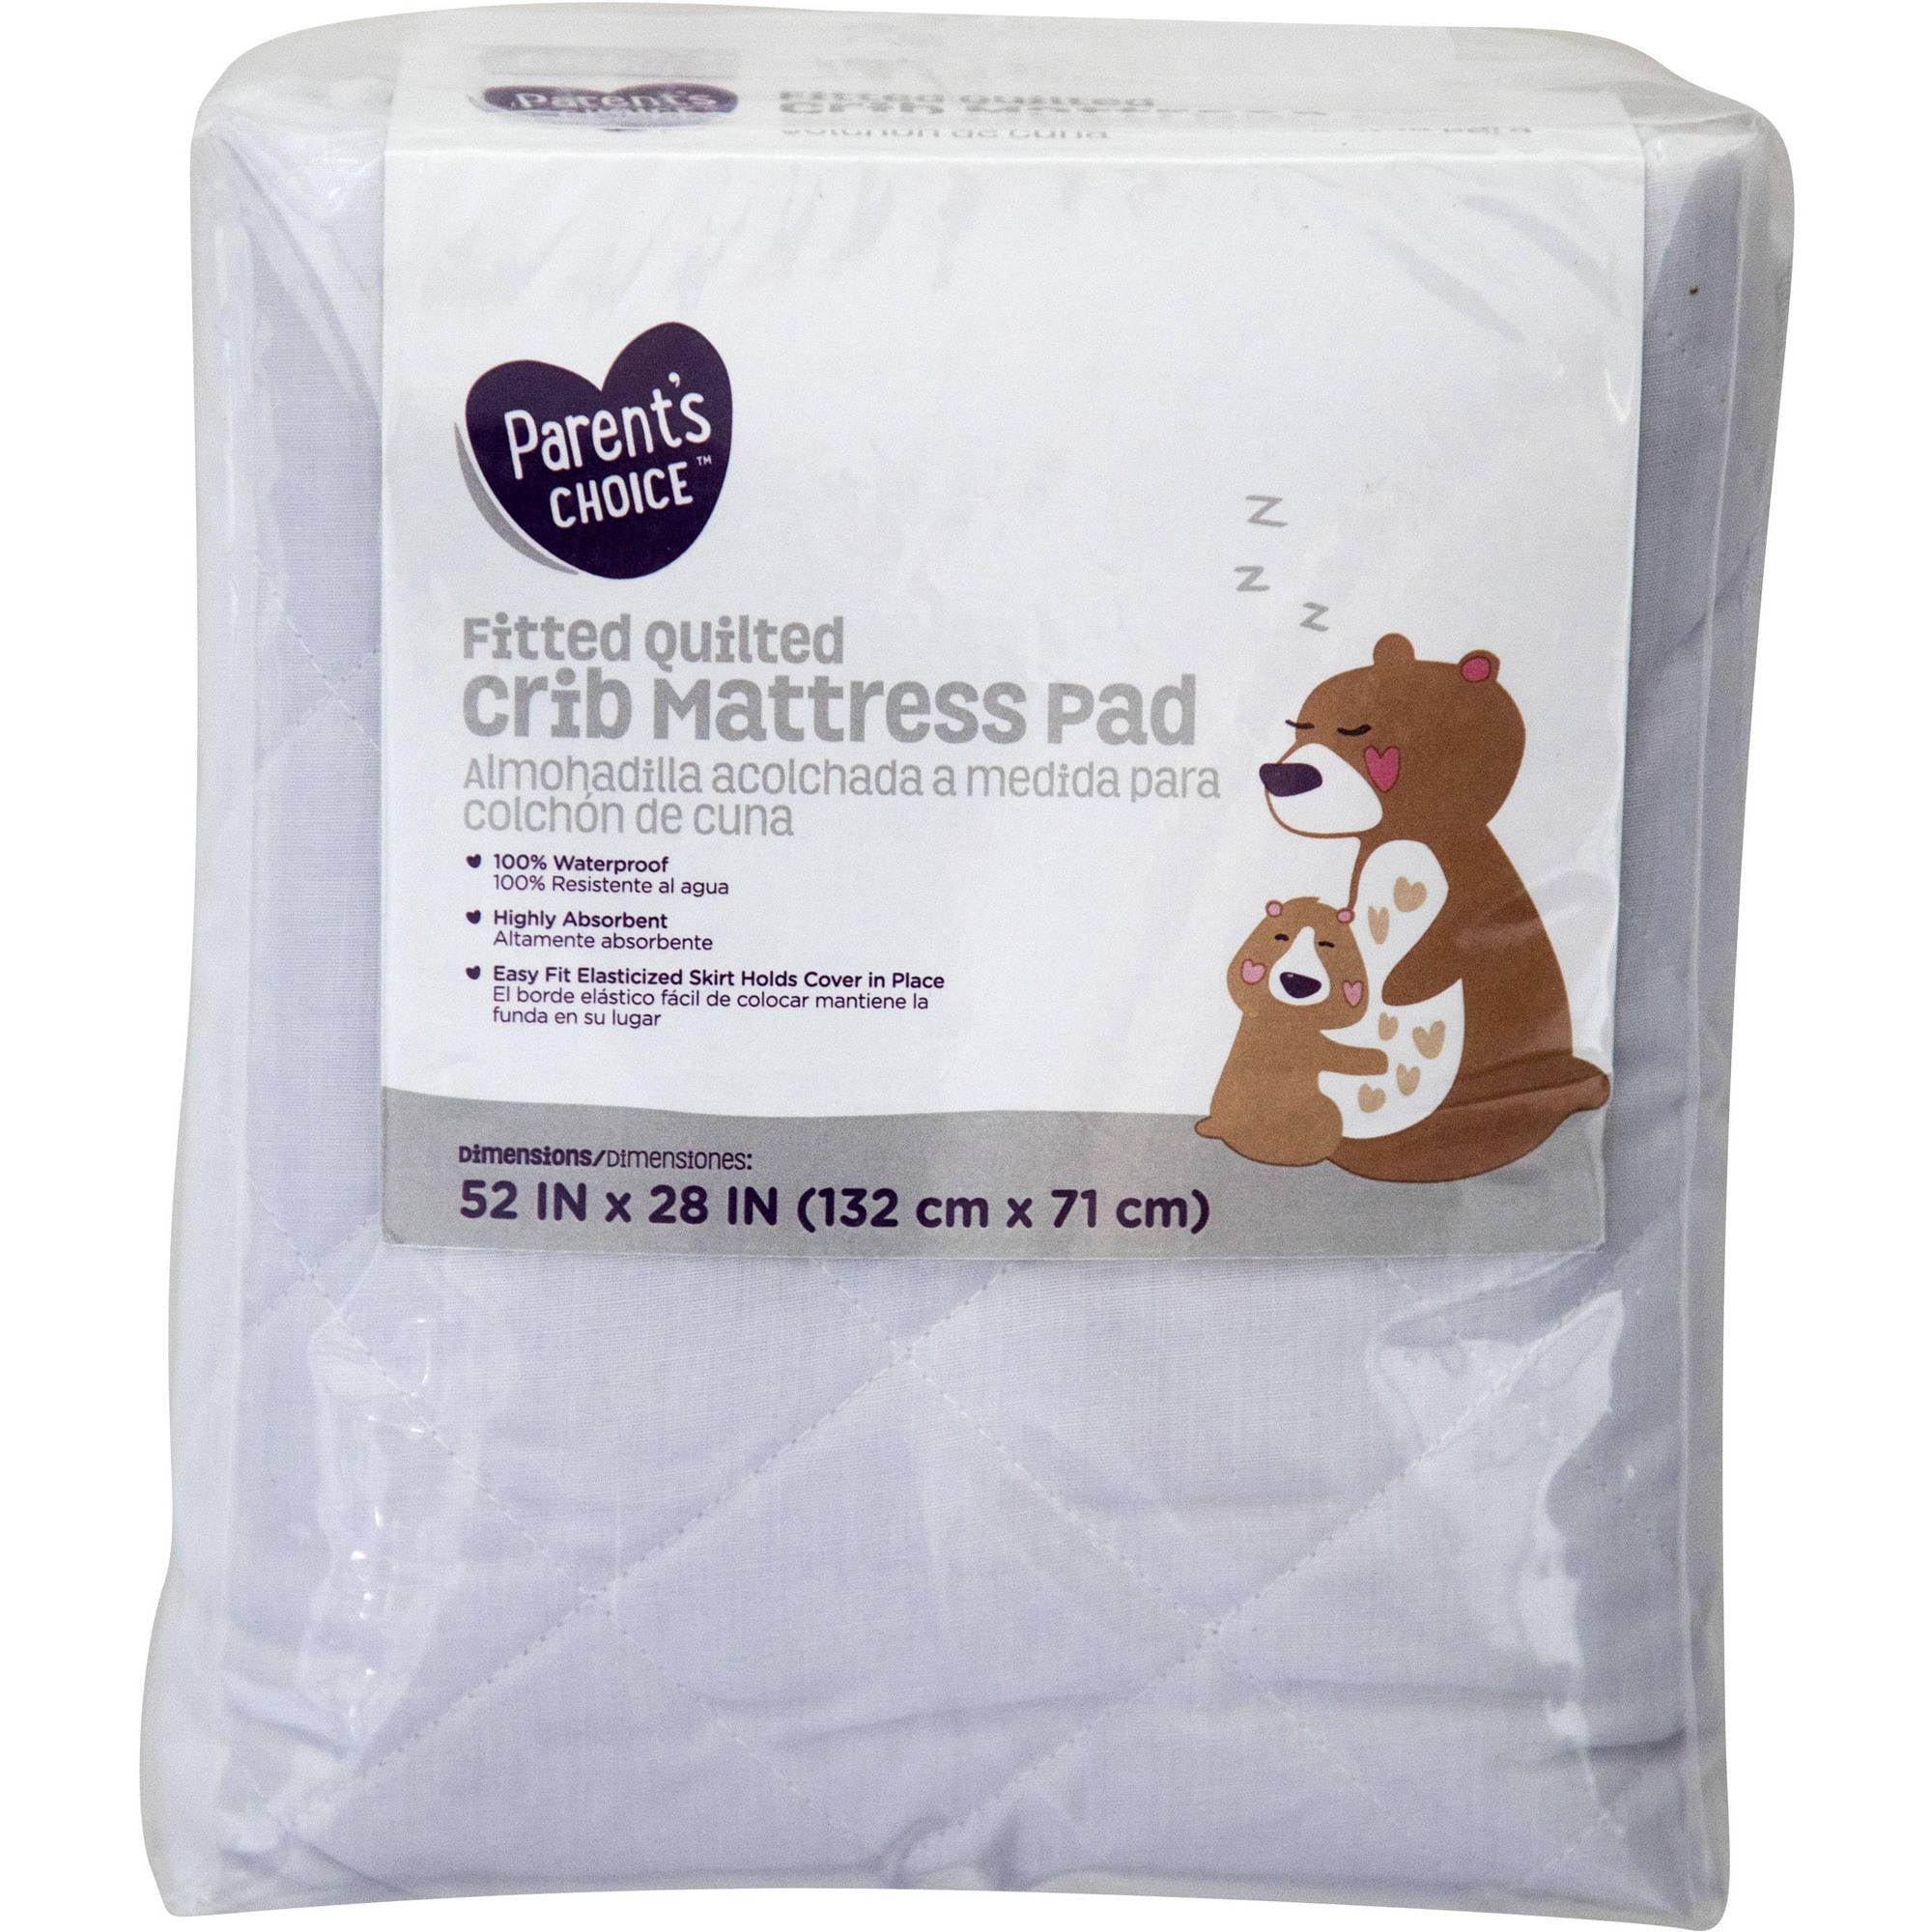 smart main protectors mattress co dri waterproof living textiles protector pad crib products